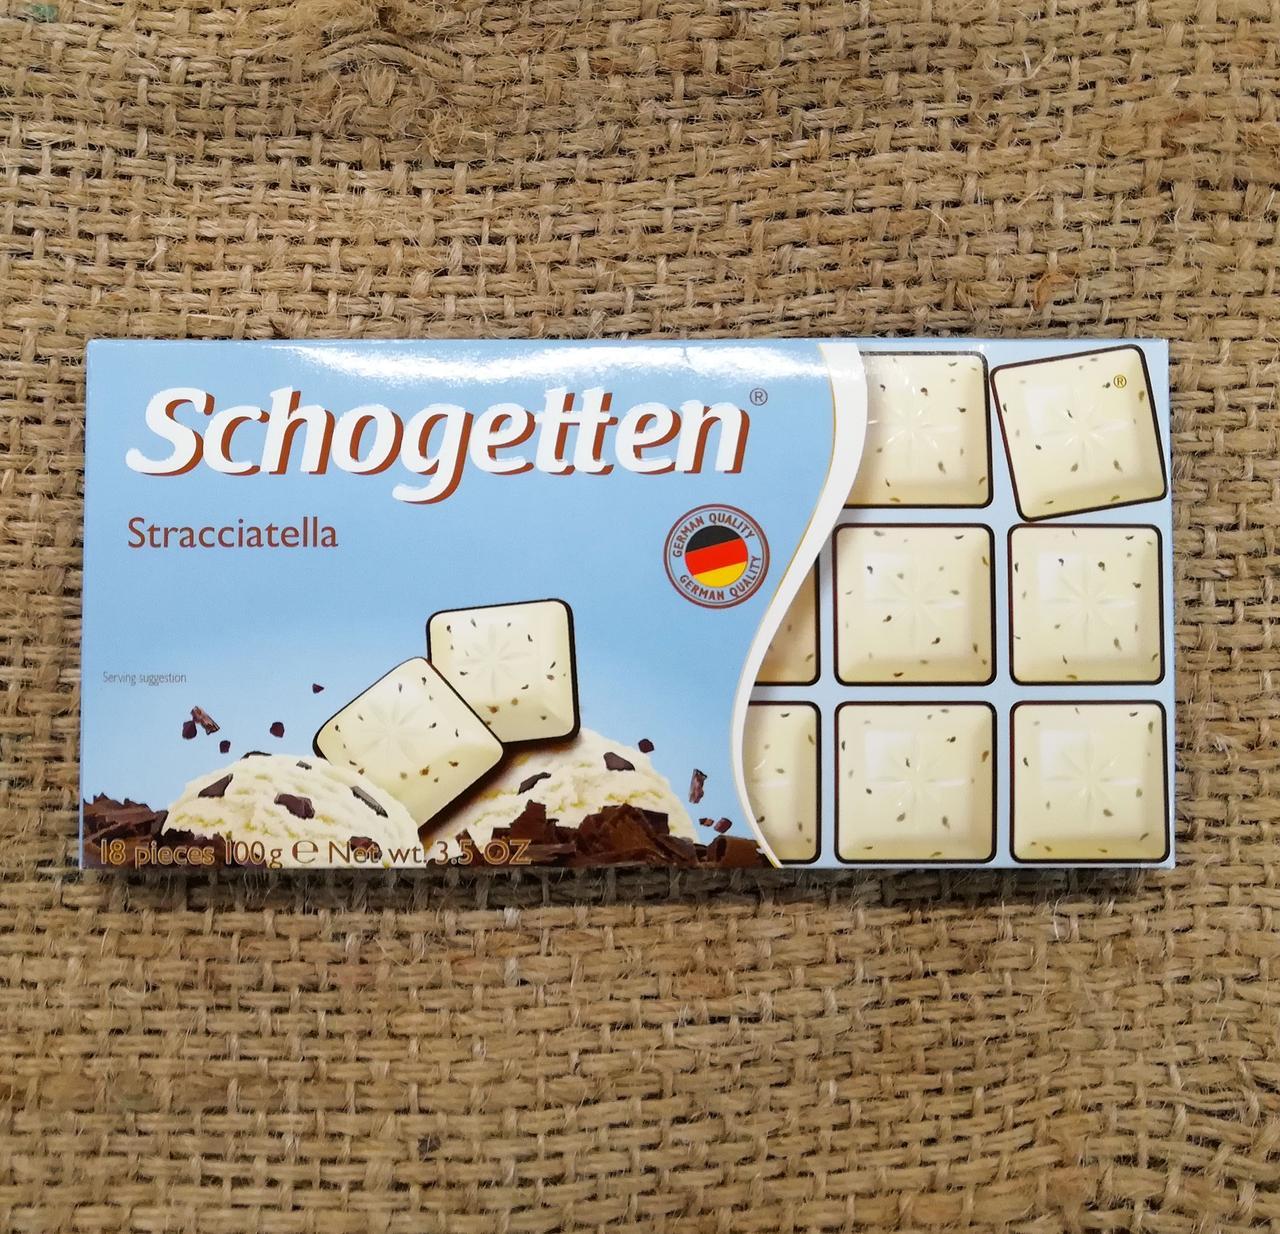 Шоколад Schogetten Stracciatella 100 gramm